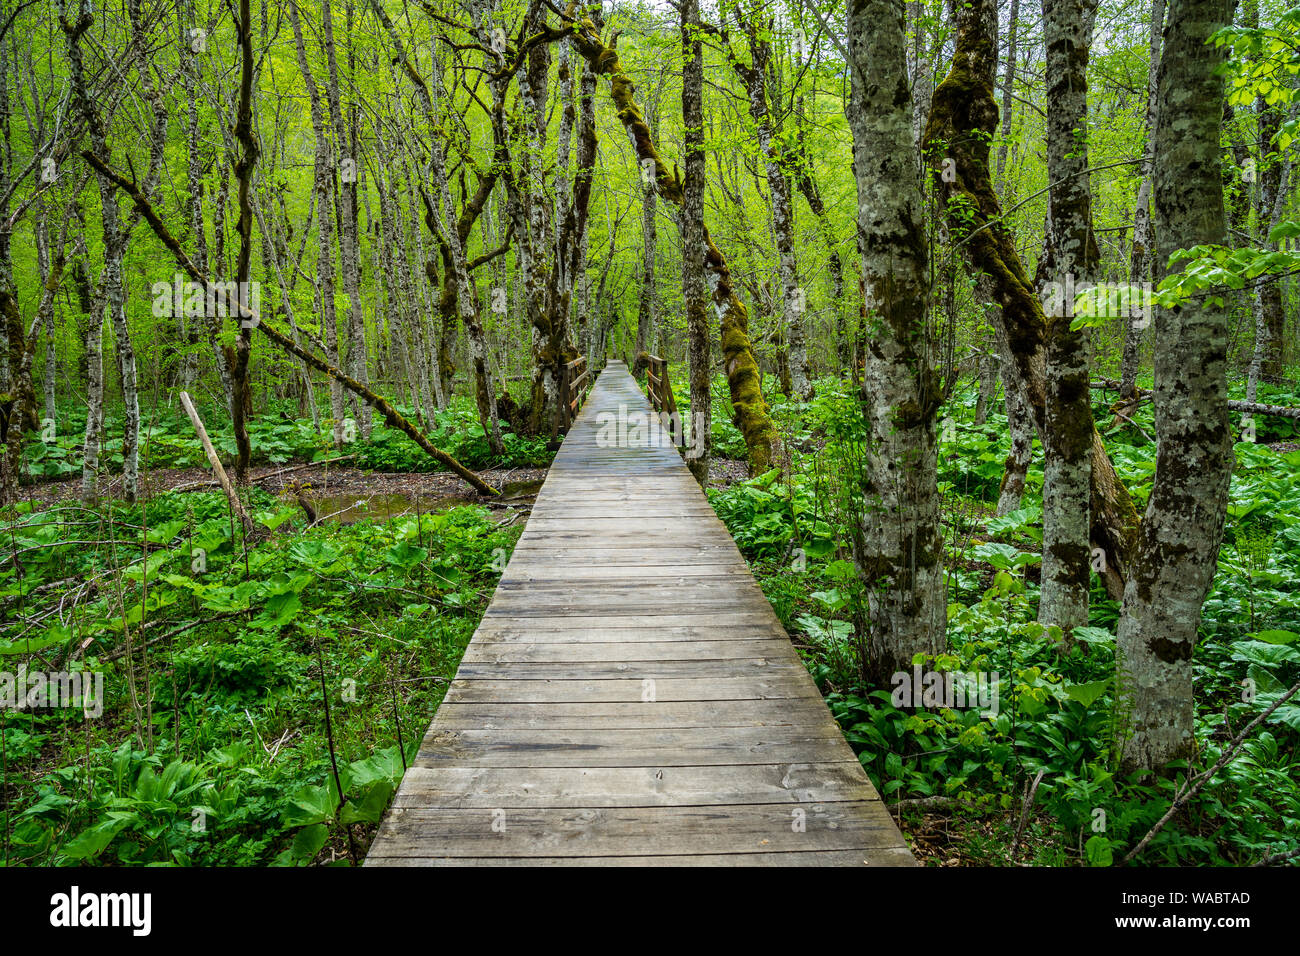 Montenegro, Endless wooden walkway path through green unspoiled rainforest nature landscape and mire of biogradska gora national park Stock Photo